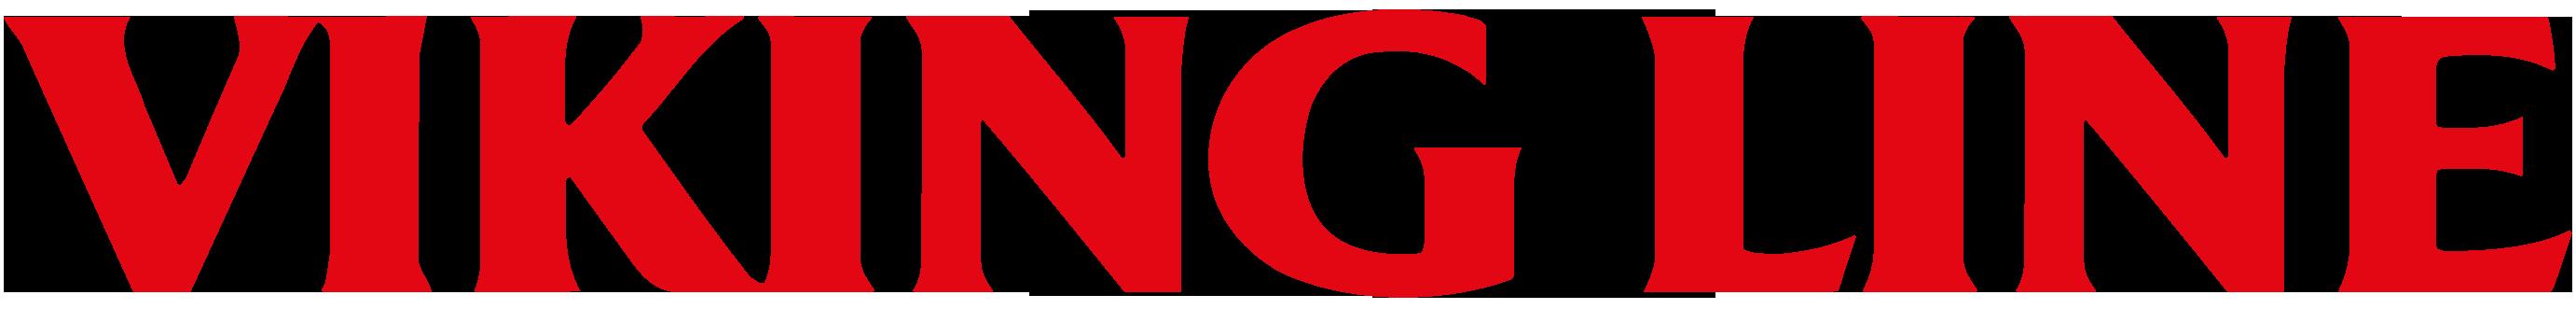 viking-line-logo-w